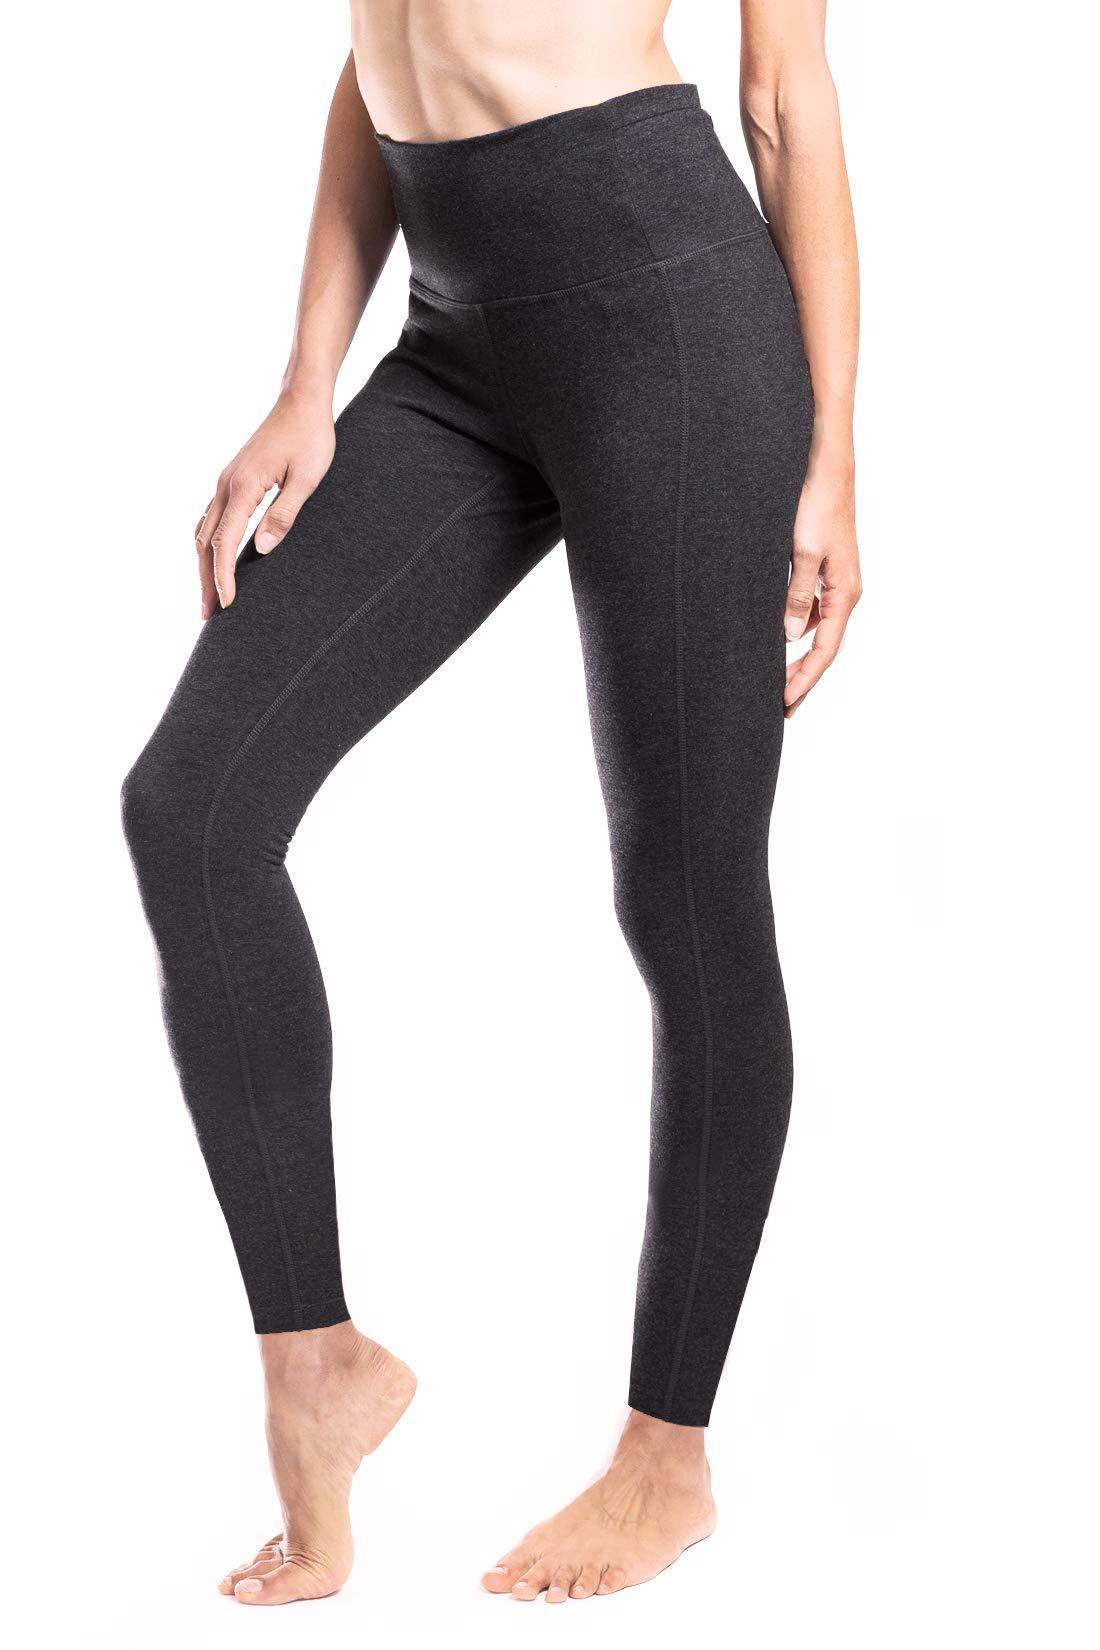 "Yogipace Regular/Tall Women's 28""/31""/34""/36"" High Waisted Extra Long Yoga Leggings Ankle Length Workout Active Pants"